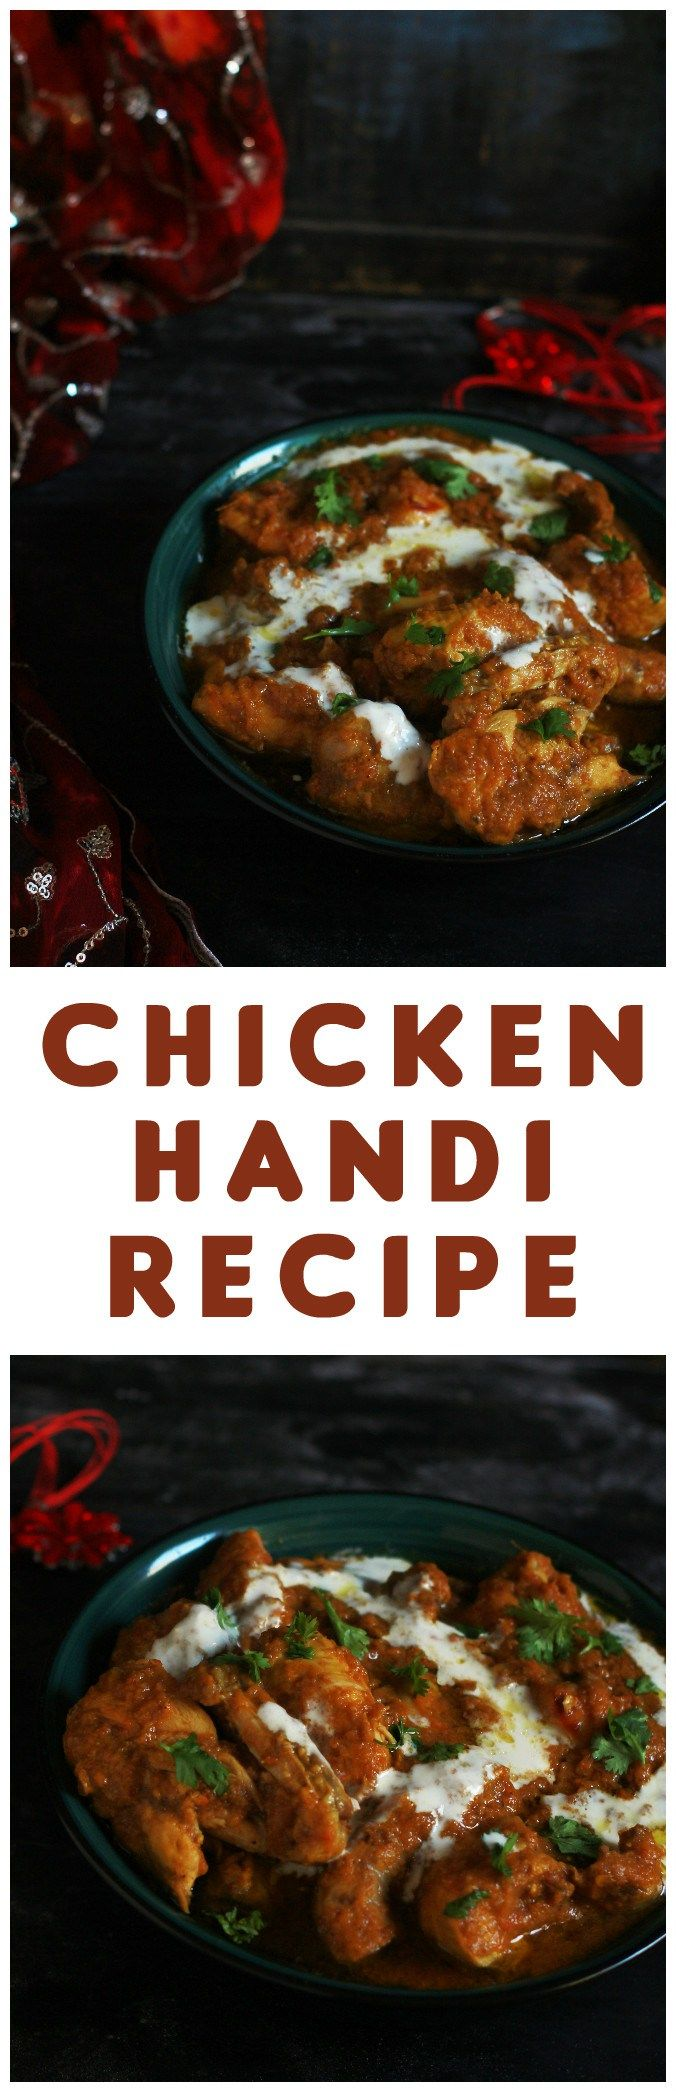 Chicken Handi Recipe How To Make Restaurant Style Chicken Handi Halaal Recipes Chicken Handi Recipes Indian Food Recipes